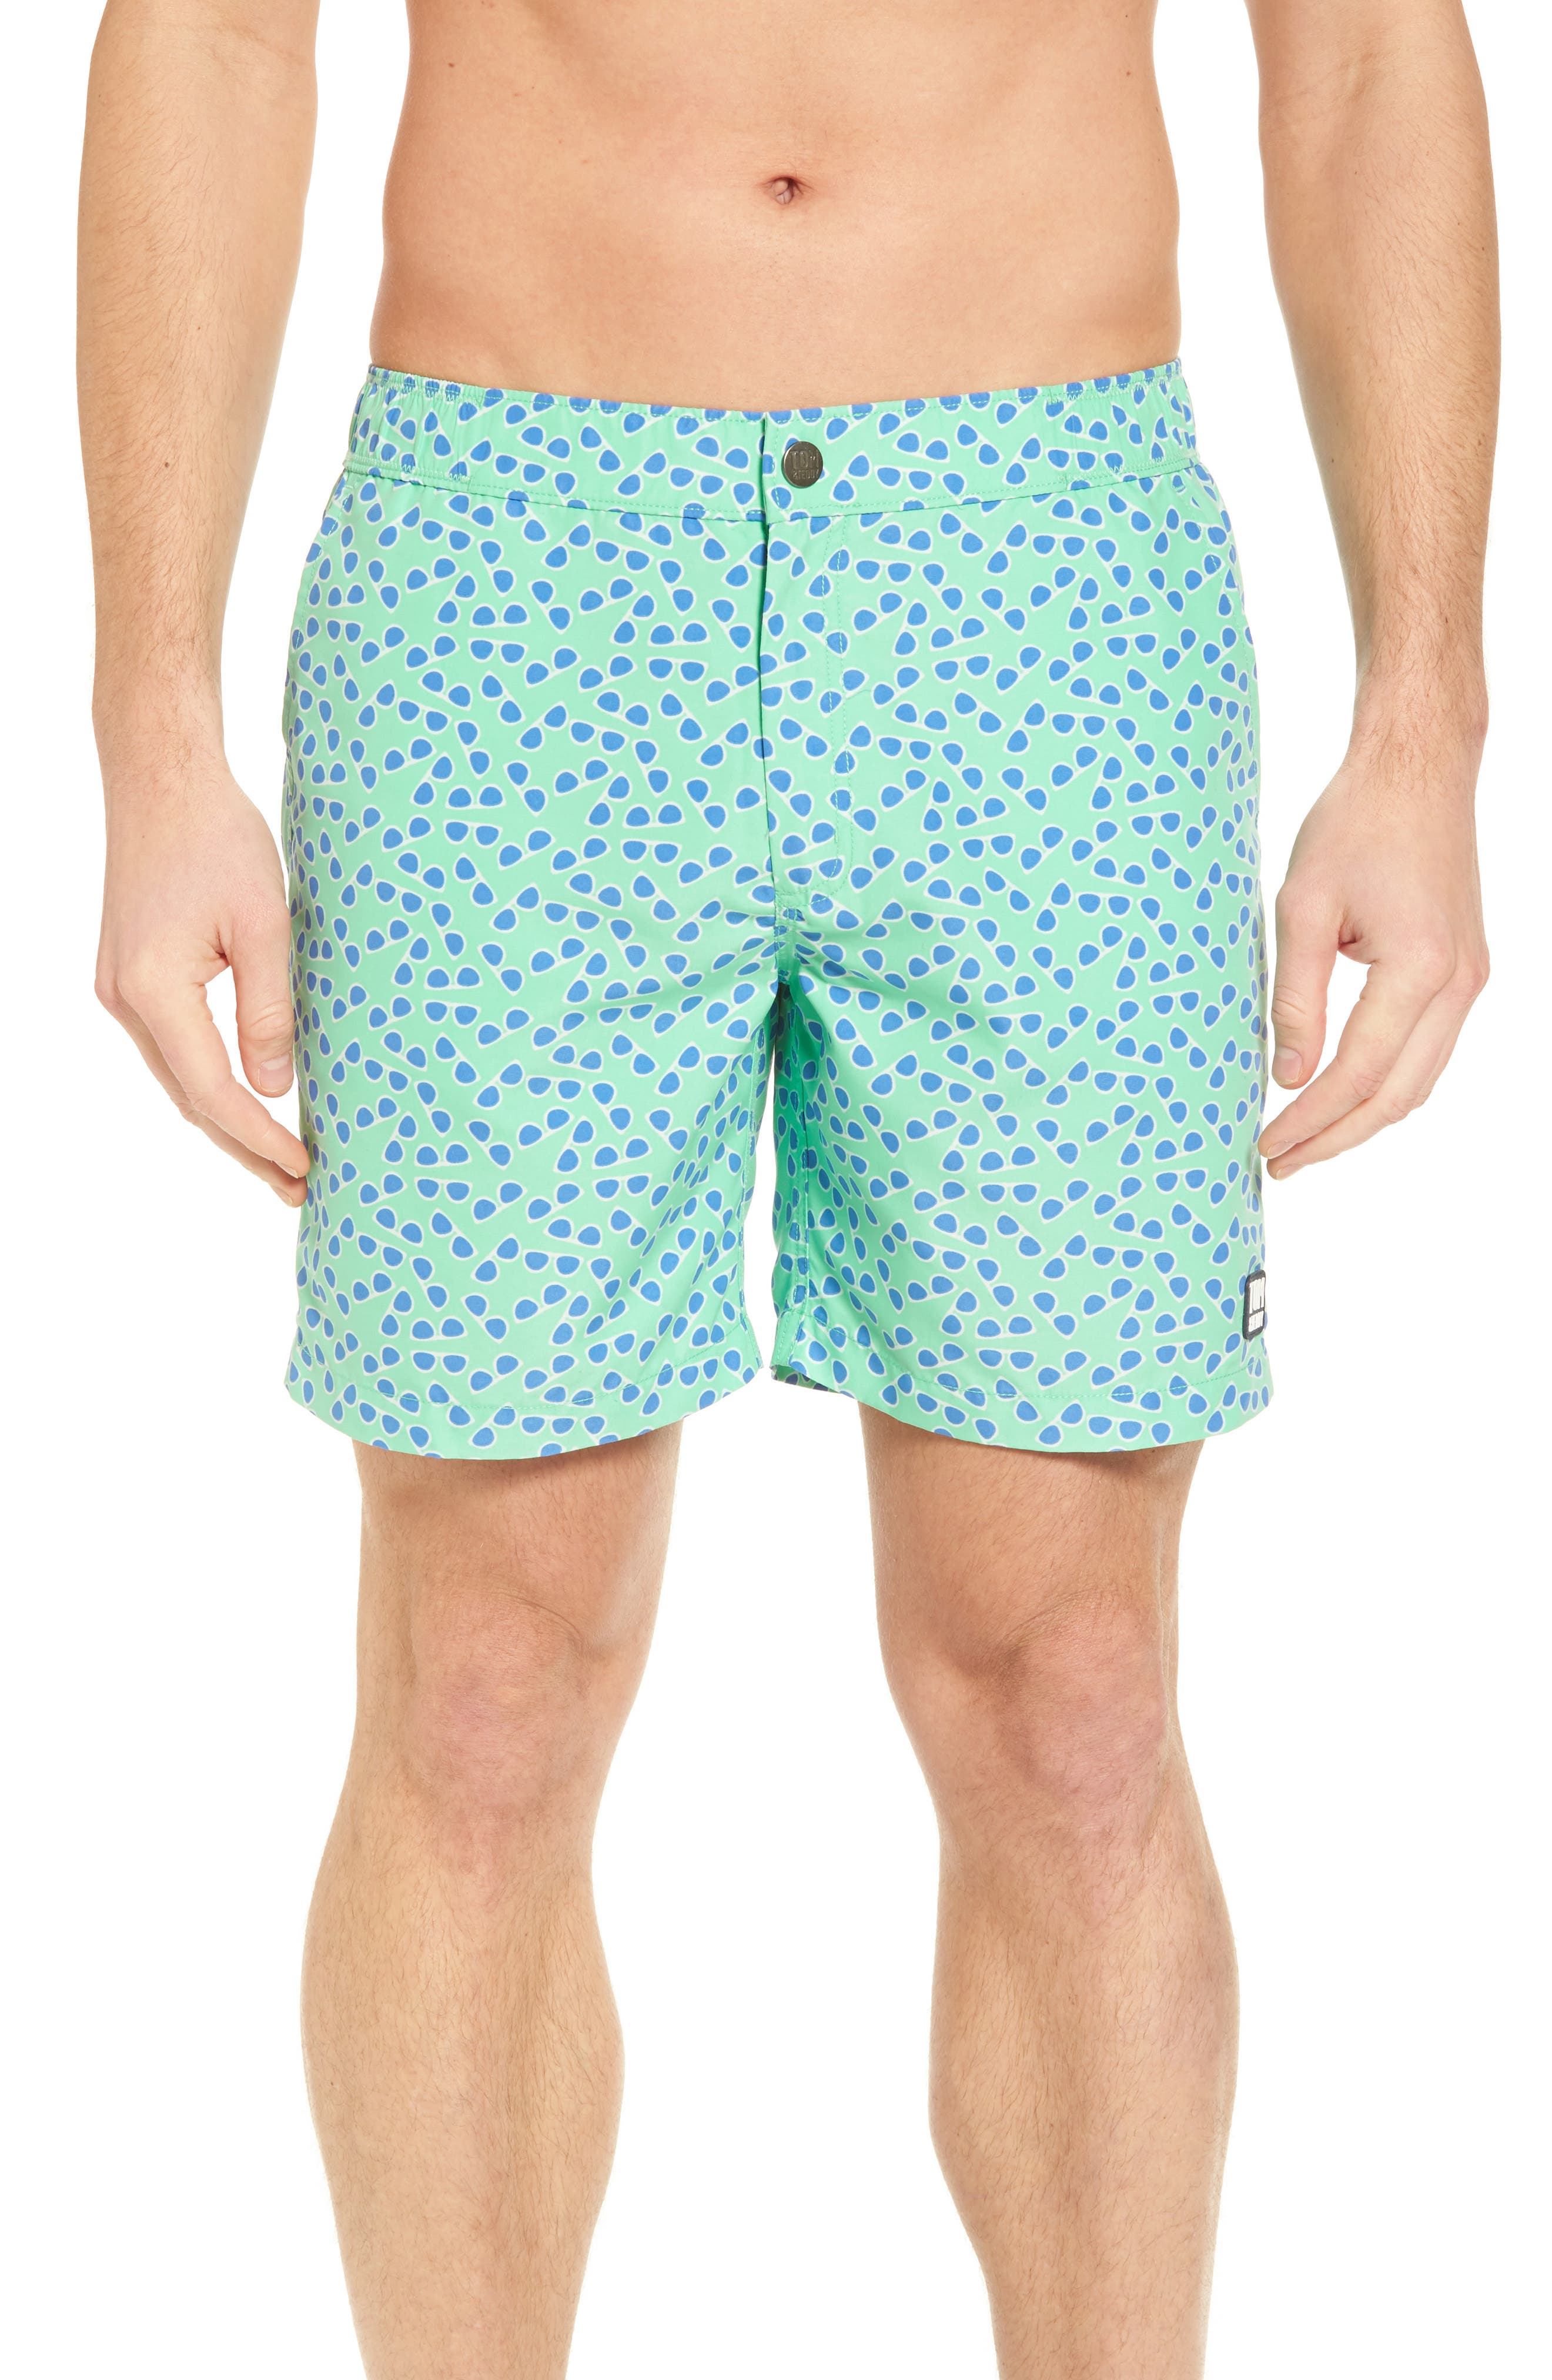 Sunglasses Print Swim Trunks,                         Main,                         color, Spring Green